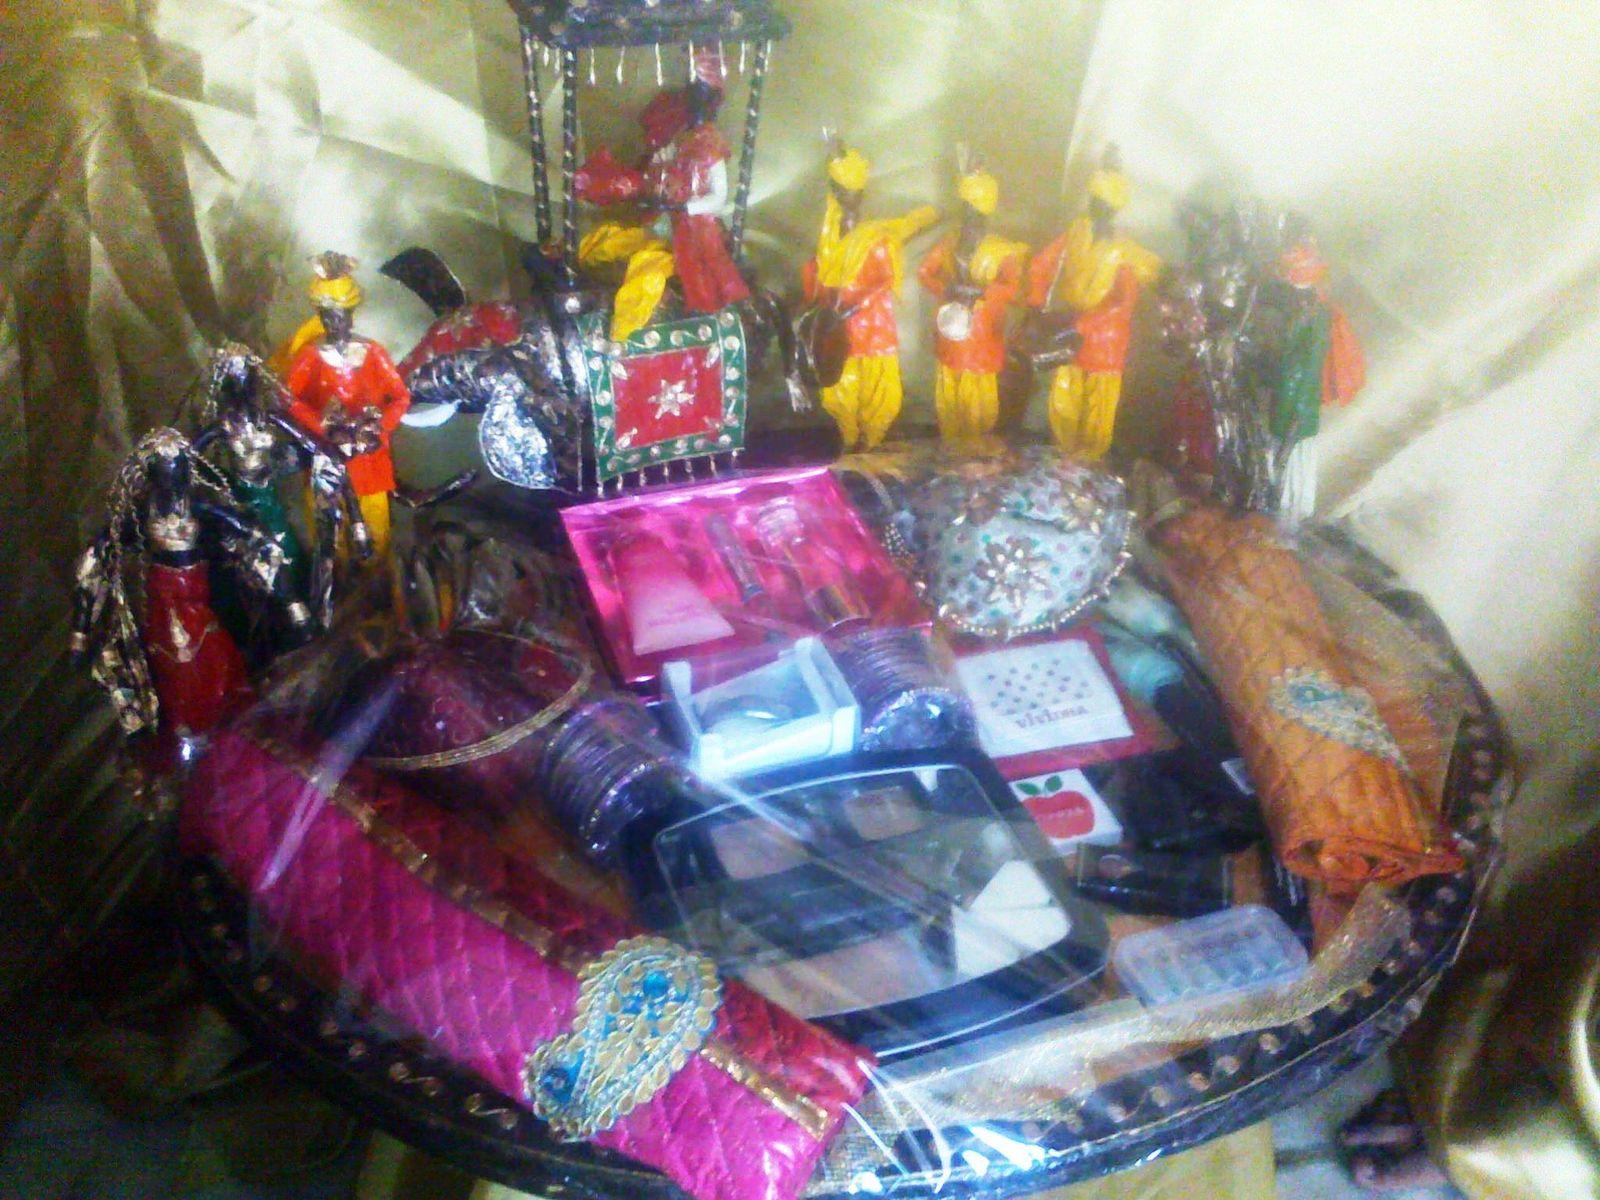 Ranjana arts ranjanaarts march 2011 holi hamper packing holi festival holi he holi hamper packing holi day holi trousseau packing wedding packing shaadi packing junglespirit Images